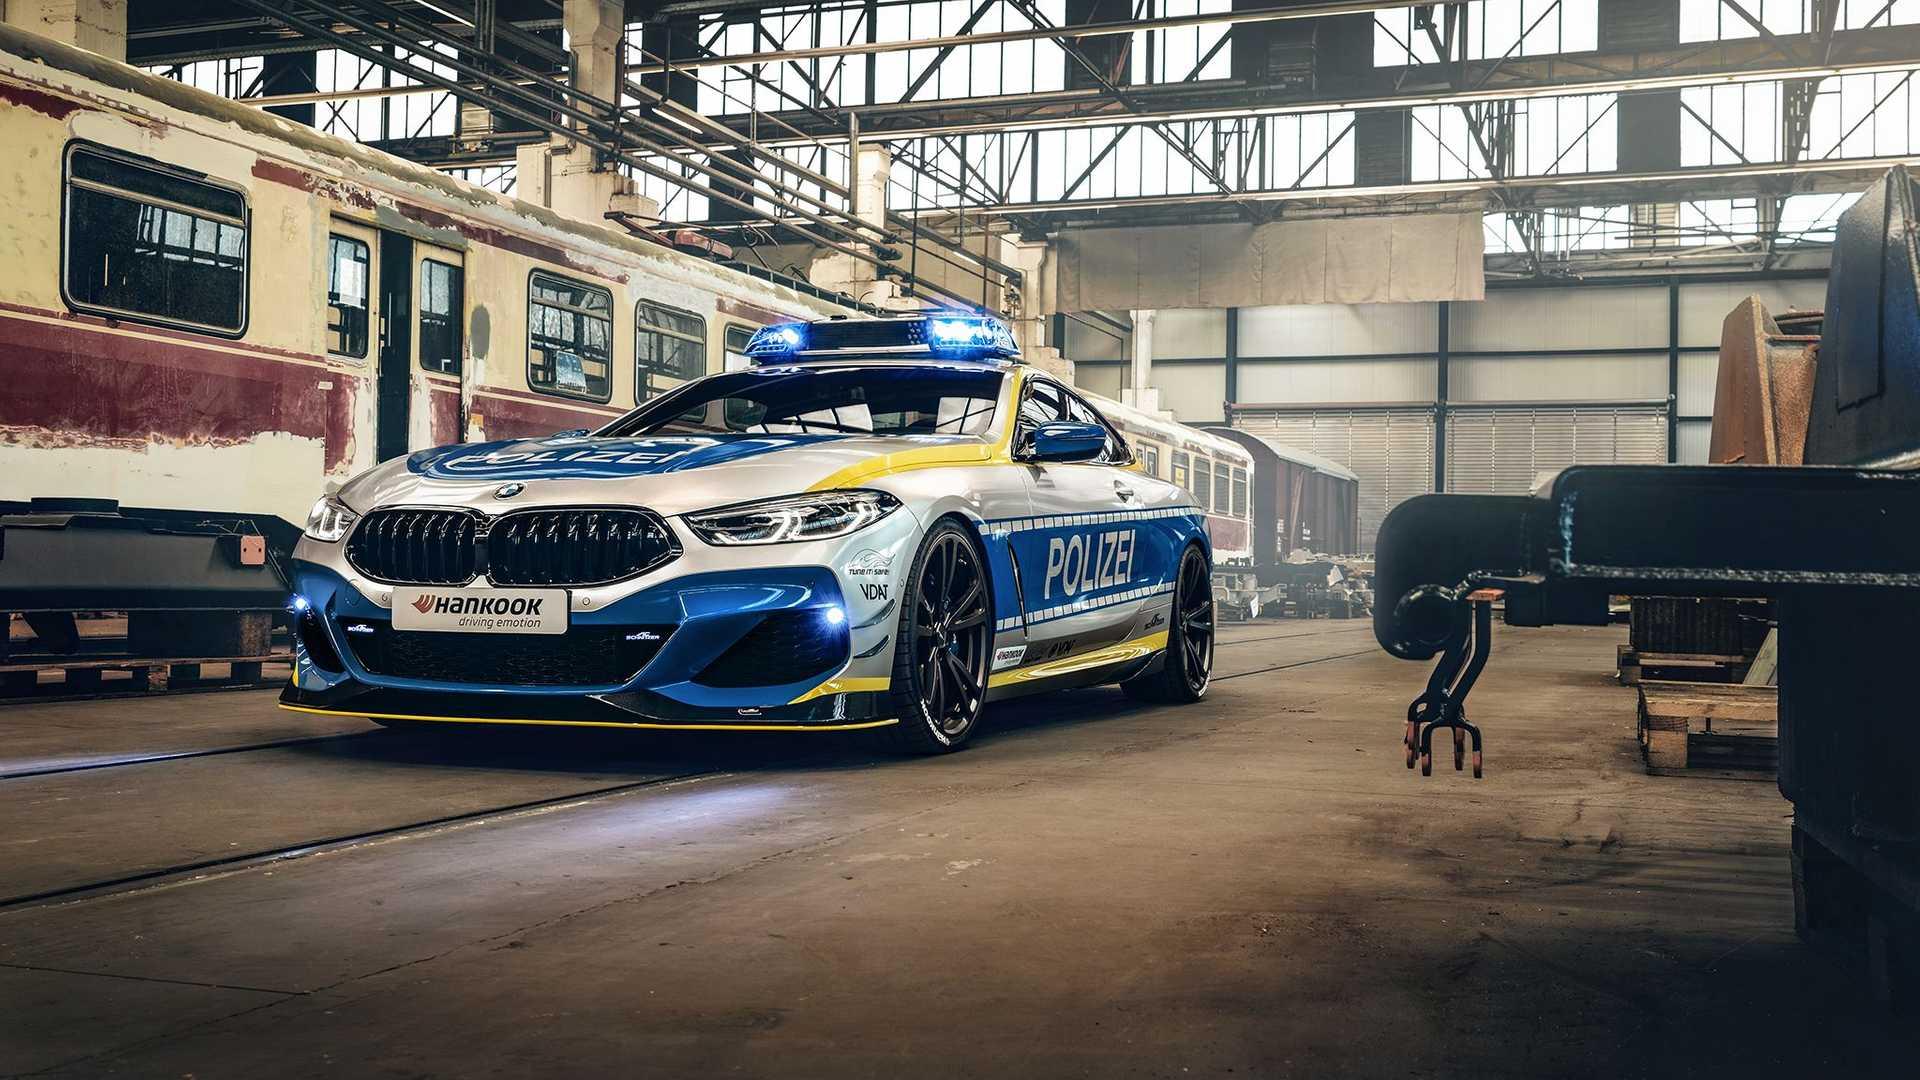 BMW-M850i-police-car-tune-it-safe-11